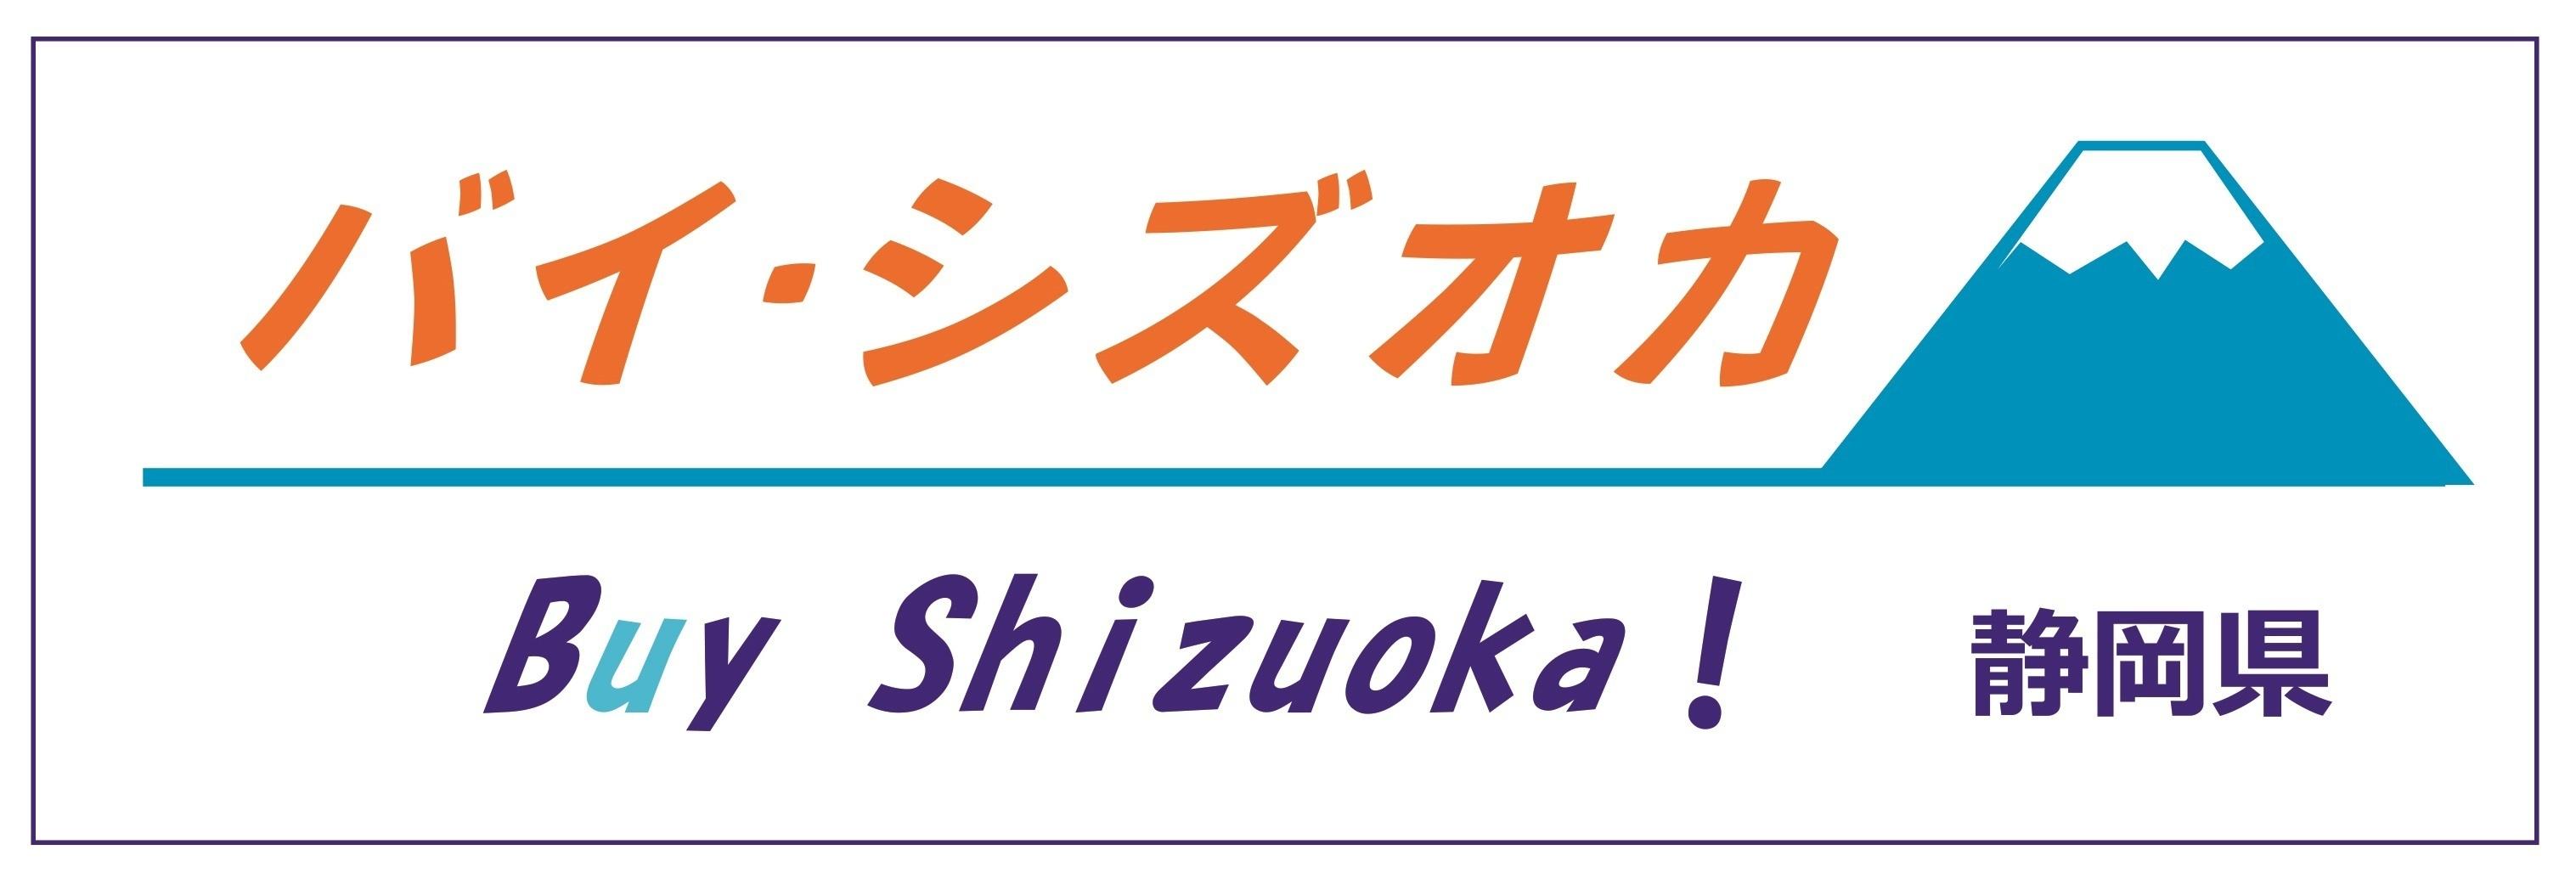 buy-shizuoka_A4-2X4